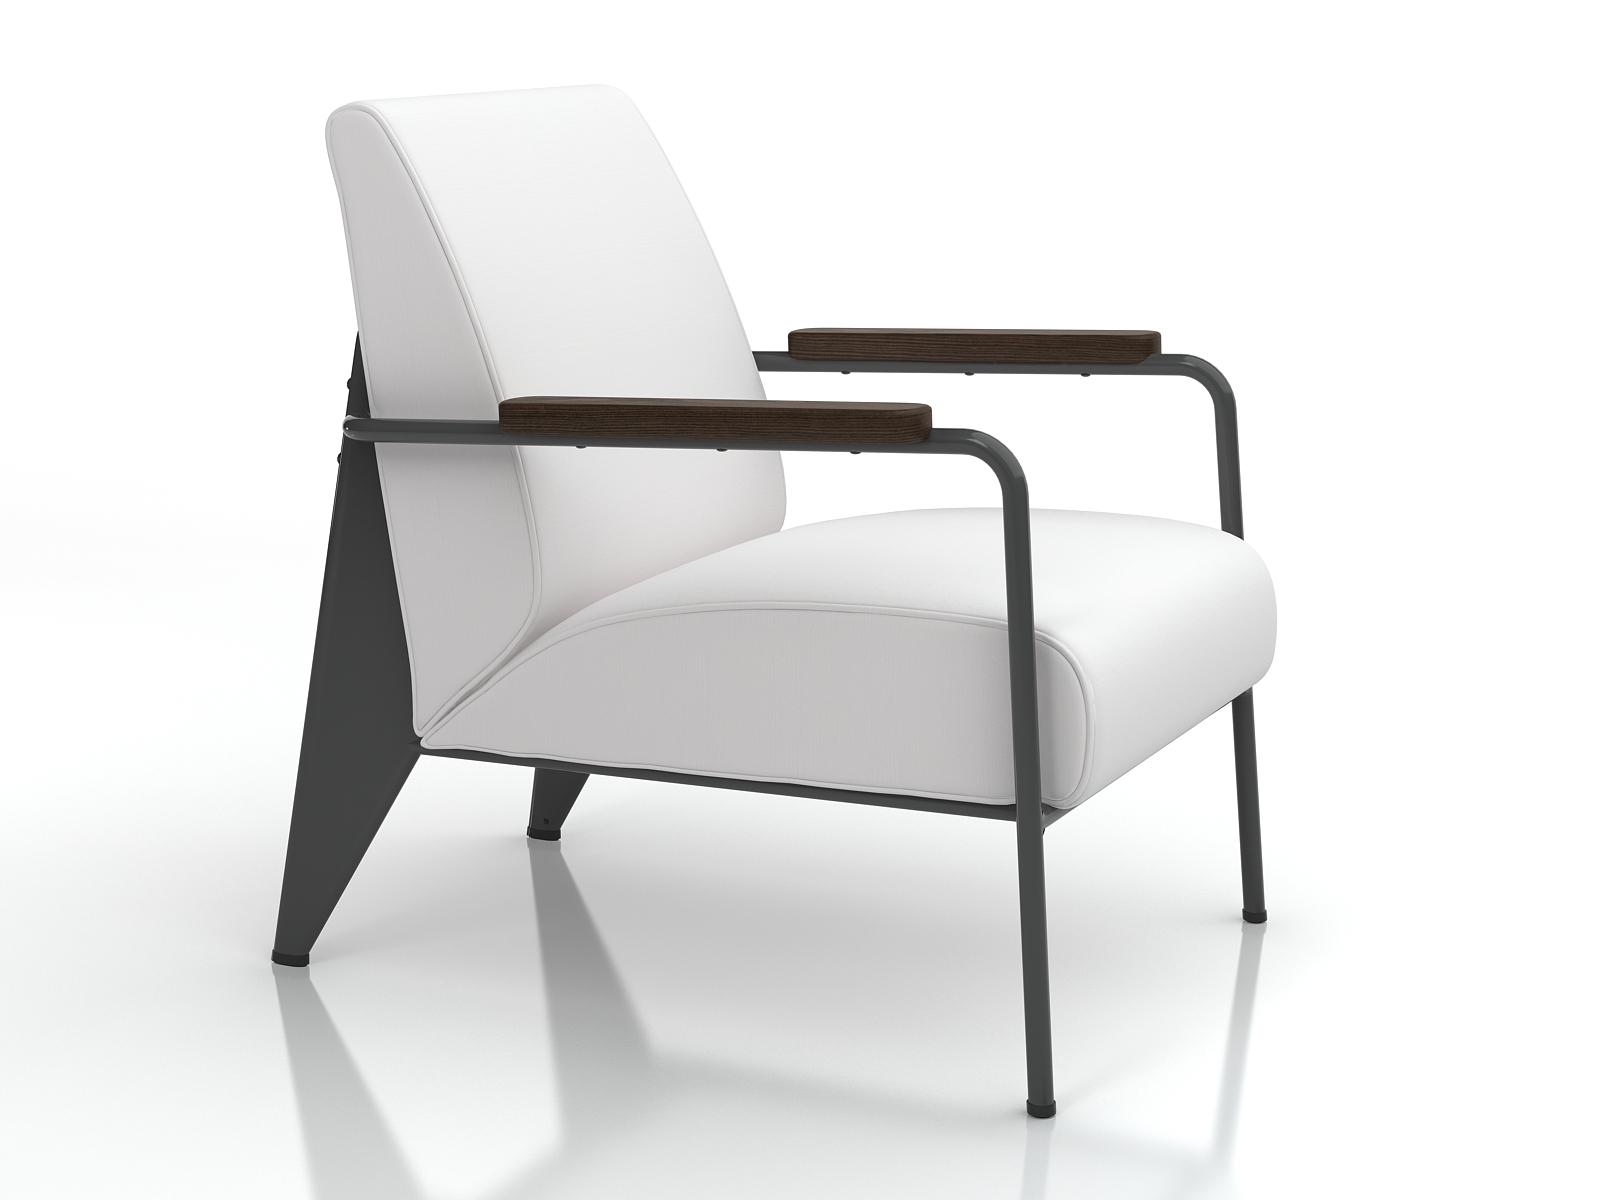 vitra fauteuil de salon 1 by dimitarkatsarov on deviantart